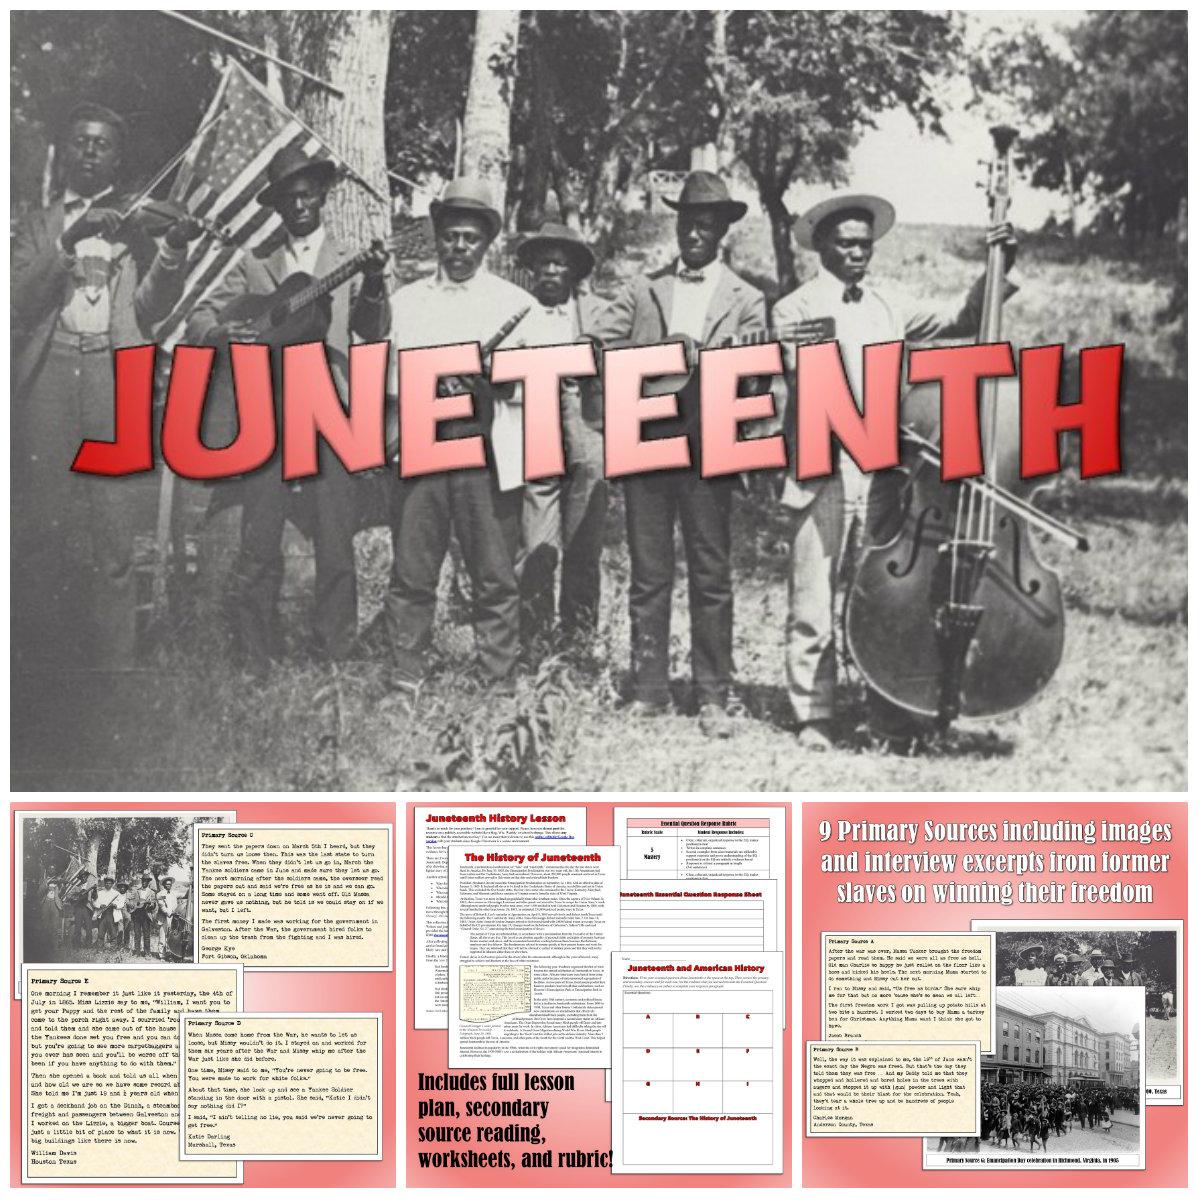 Juneteenth Lesson Plan